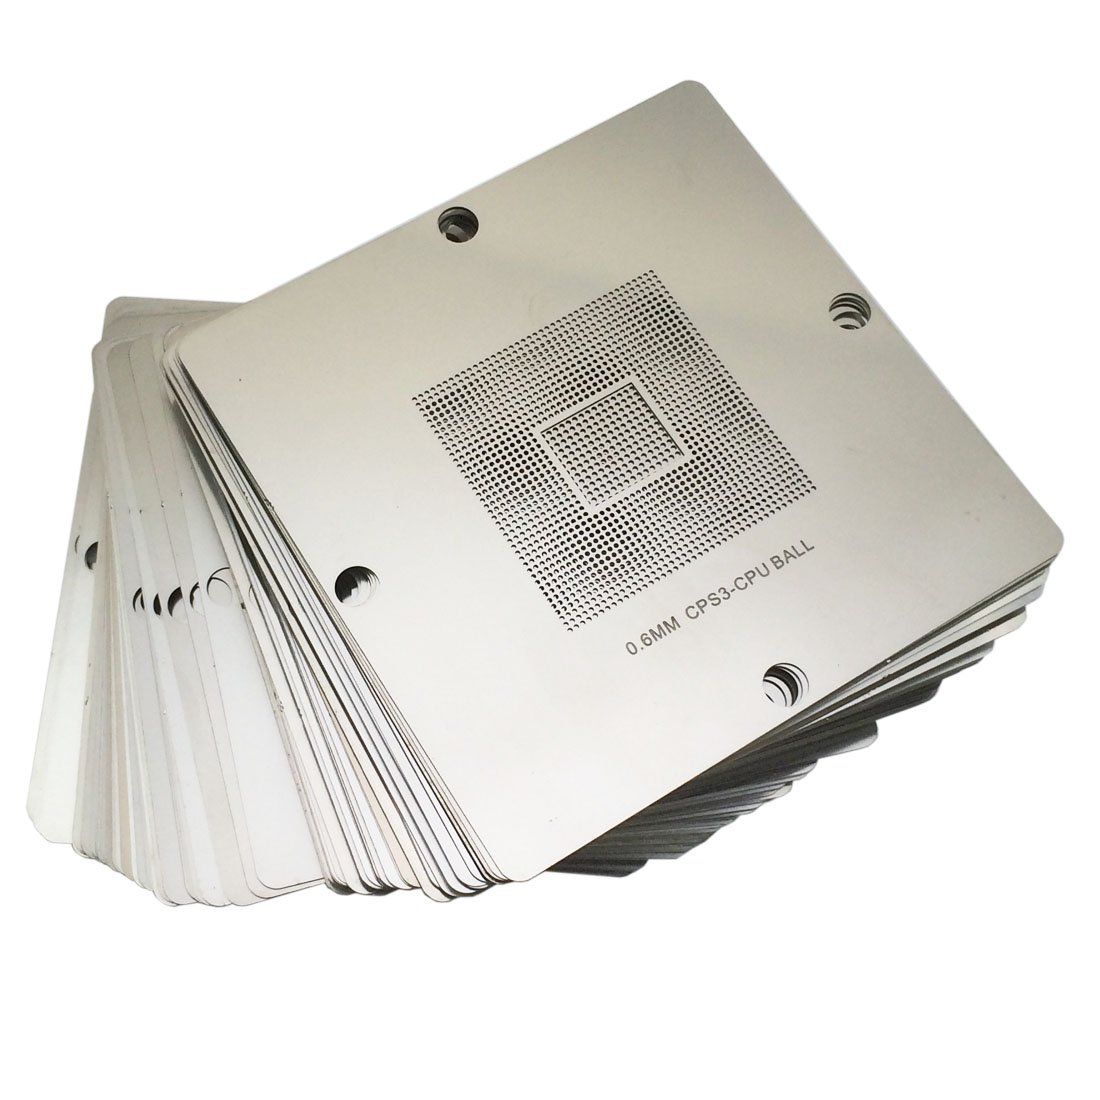 Whataval(TM) 241pcs BGA Reballing Stencils Kit for Laptop PS3 WII XBOX 360 90x90mm